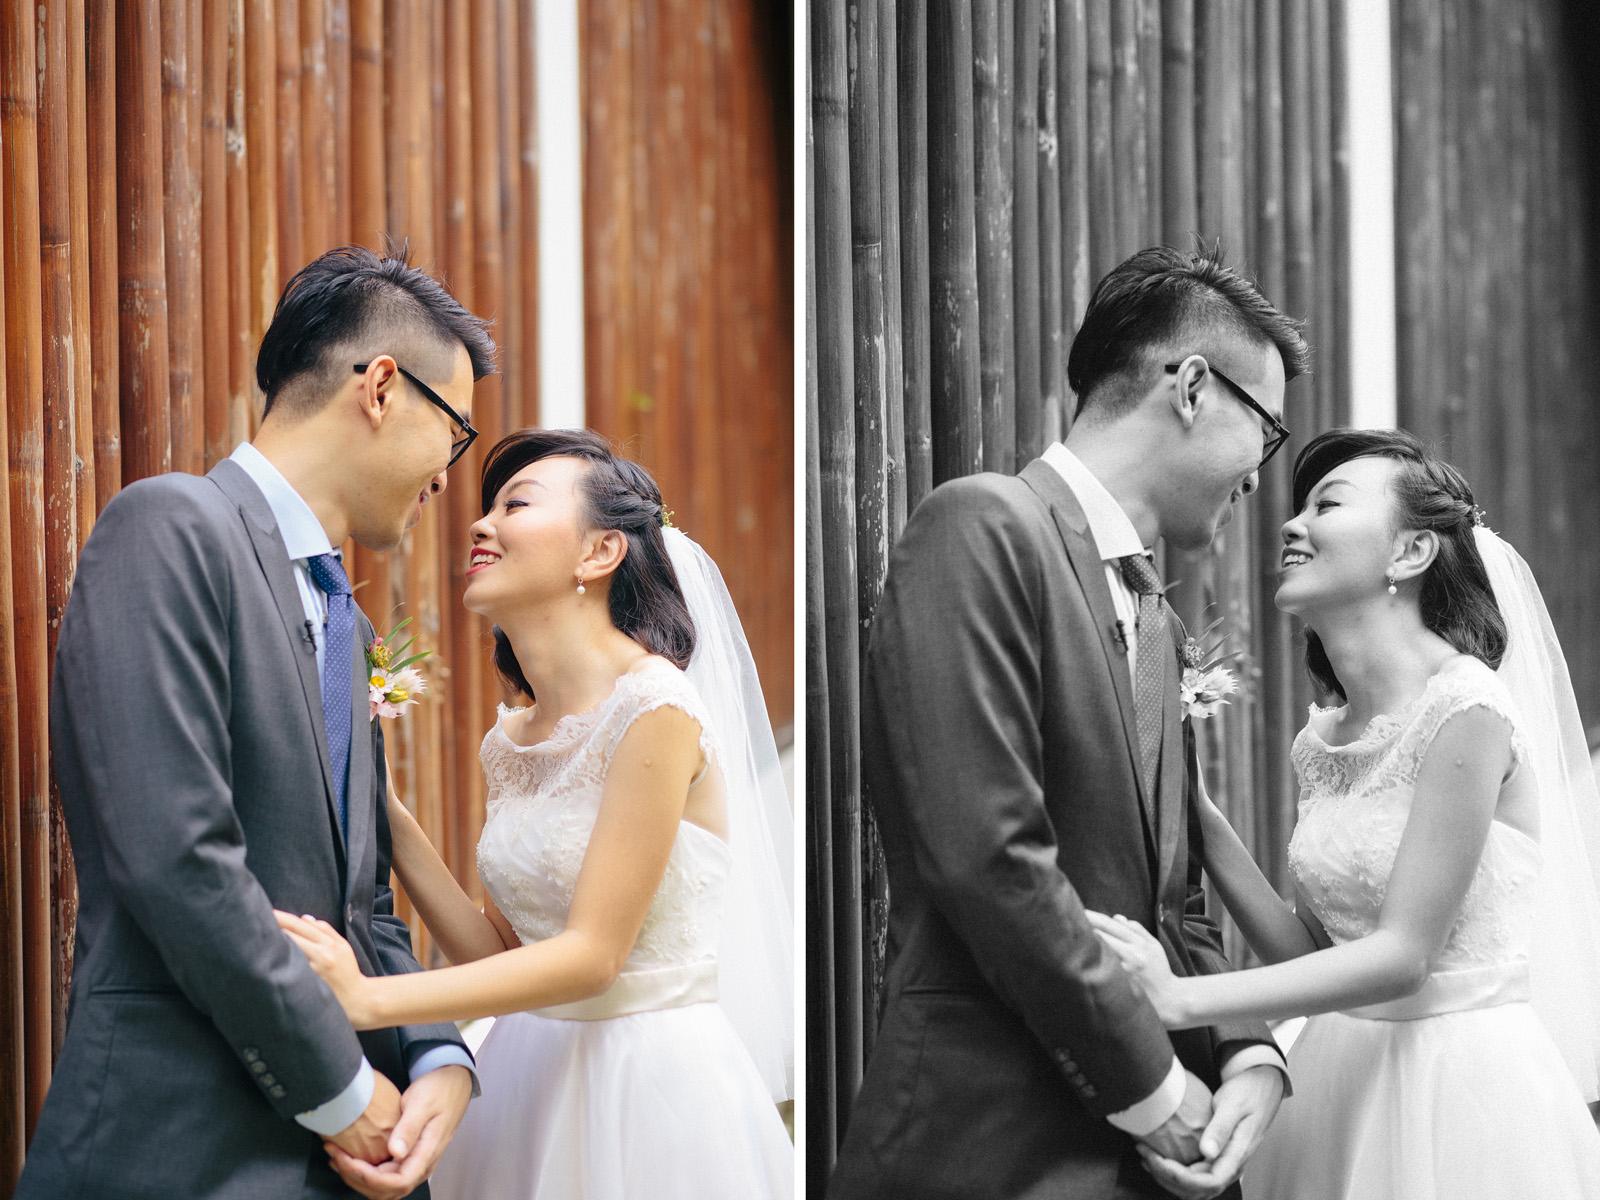 singapore-wedding-travel-photographer-faith-alvin-wedding-wmt-34.jpg